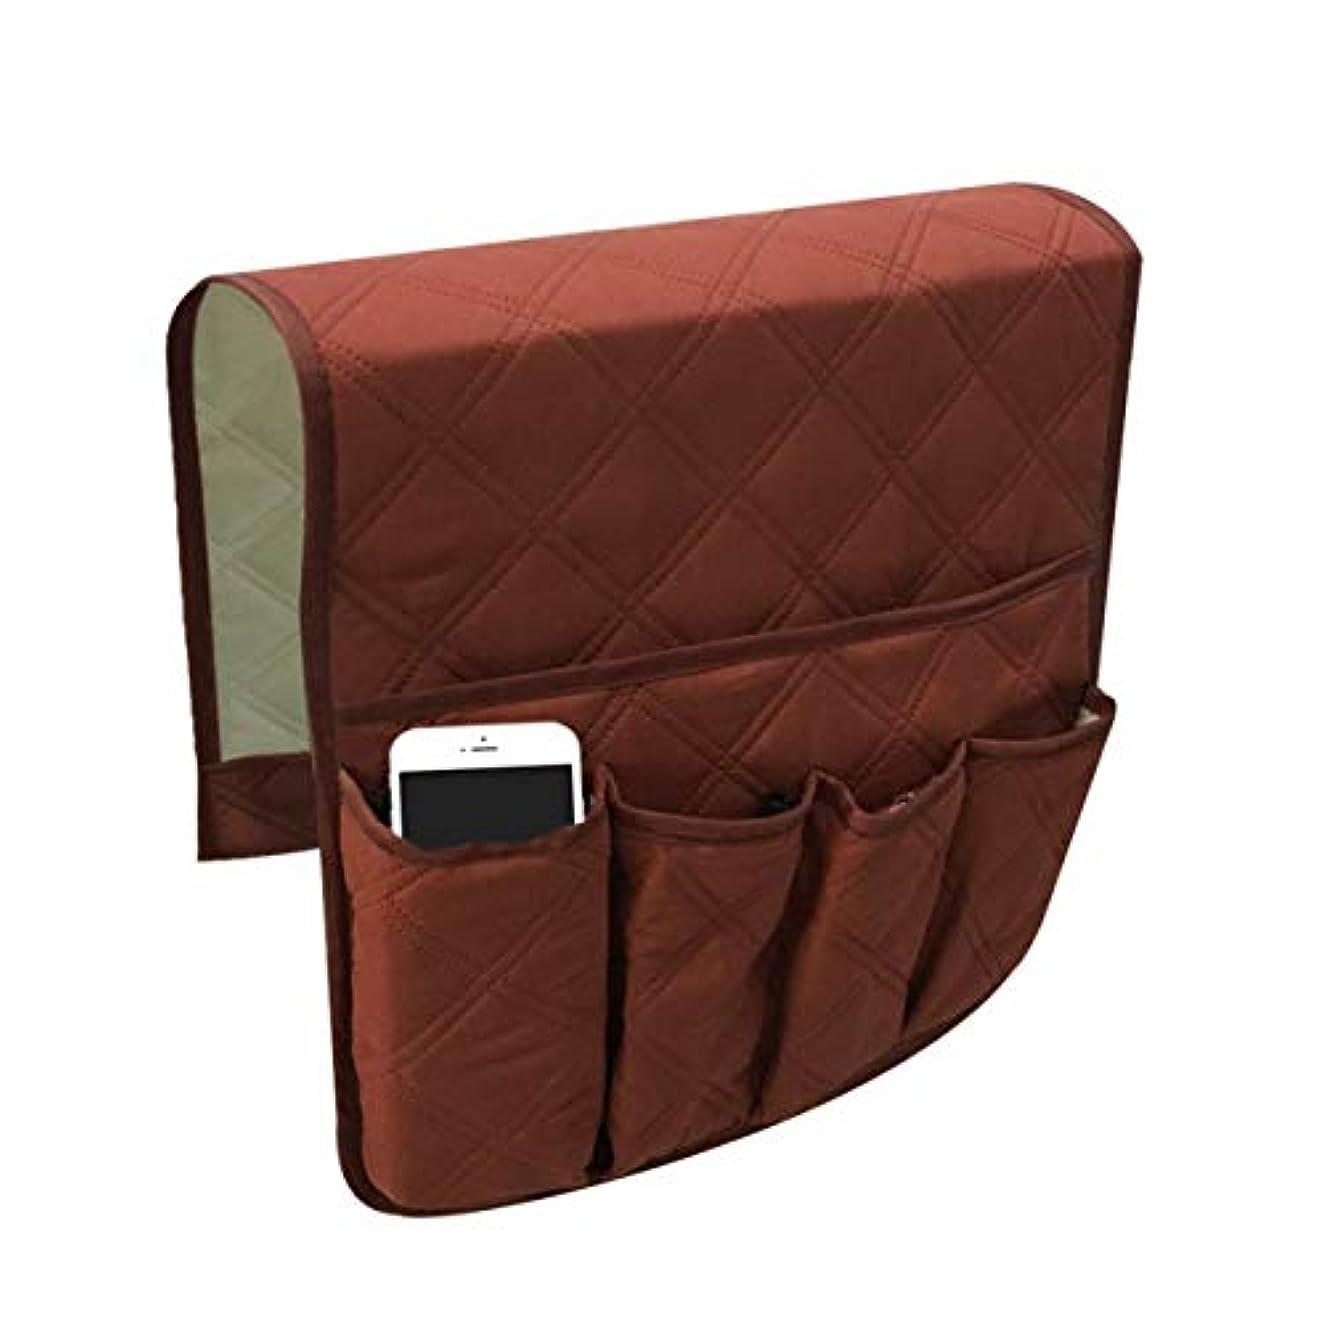 Saikogoods バッグをぶら下げ防水紬 アームチェアソファチェア 収納袋 雑貨ホルダー 家庭主催 ダークブラウン